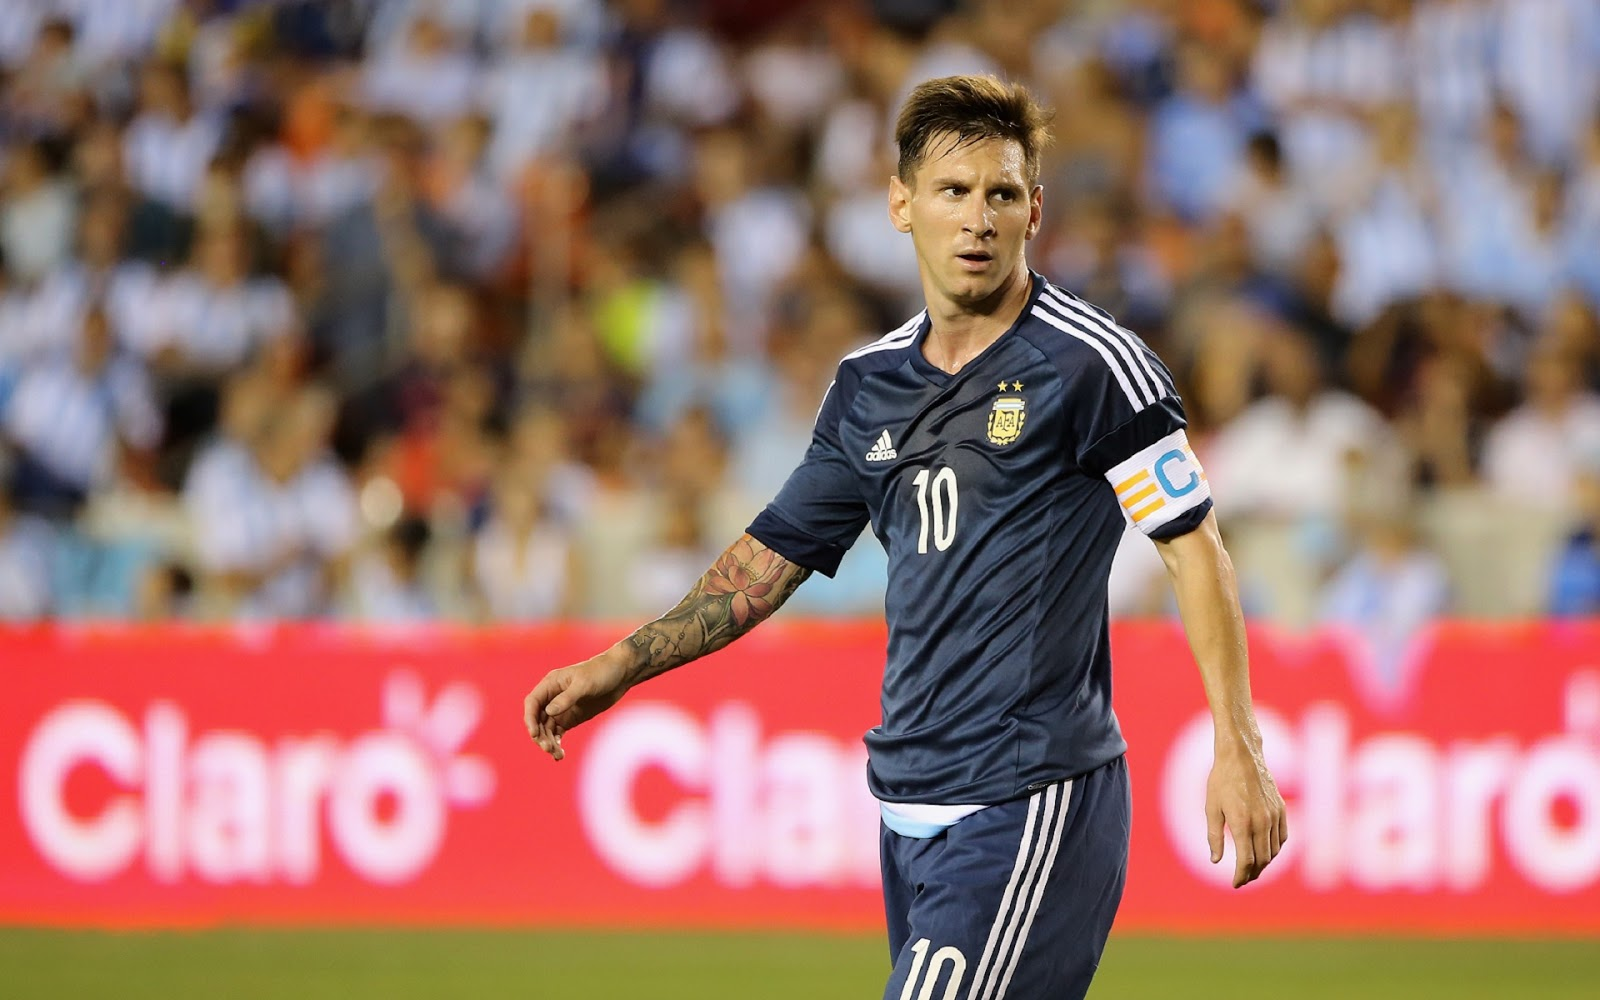 Hinh-anh-dep-nhat-cua-Lionel-Messi-%25285